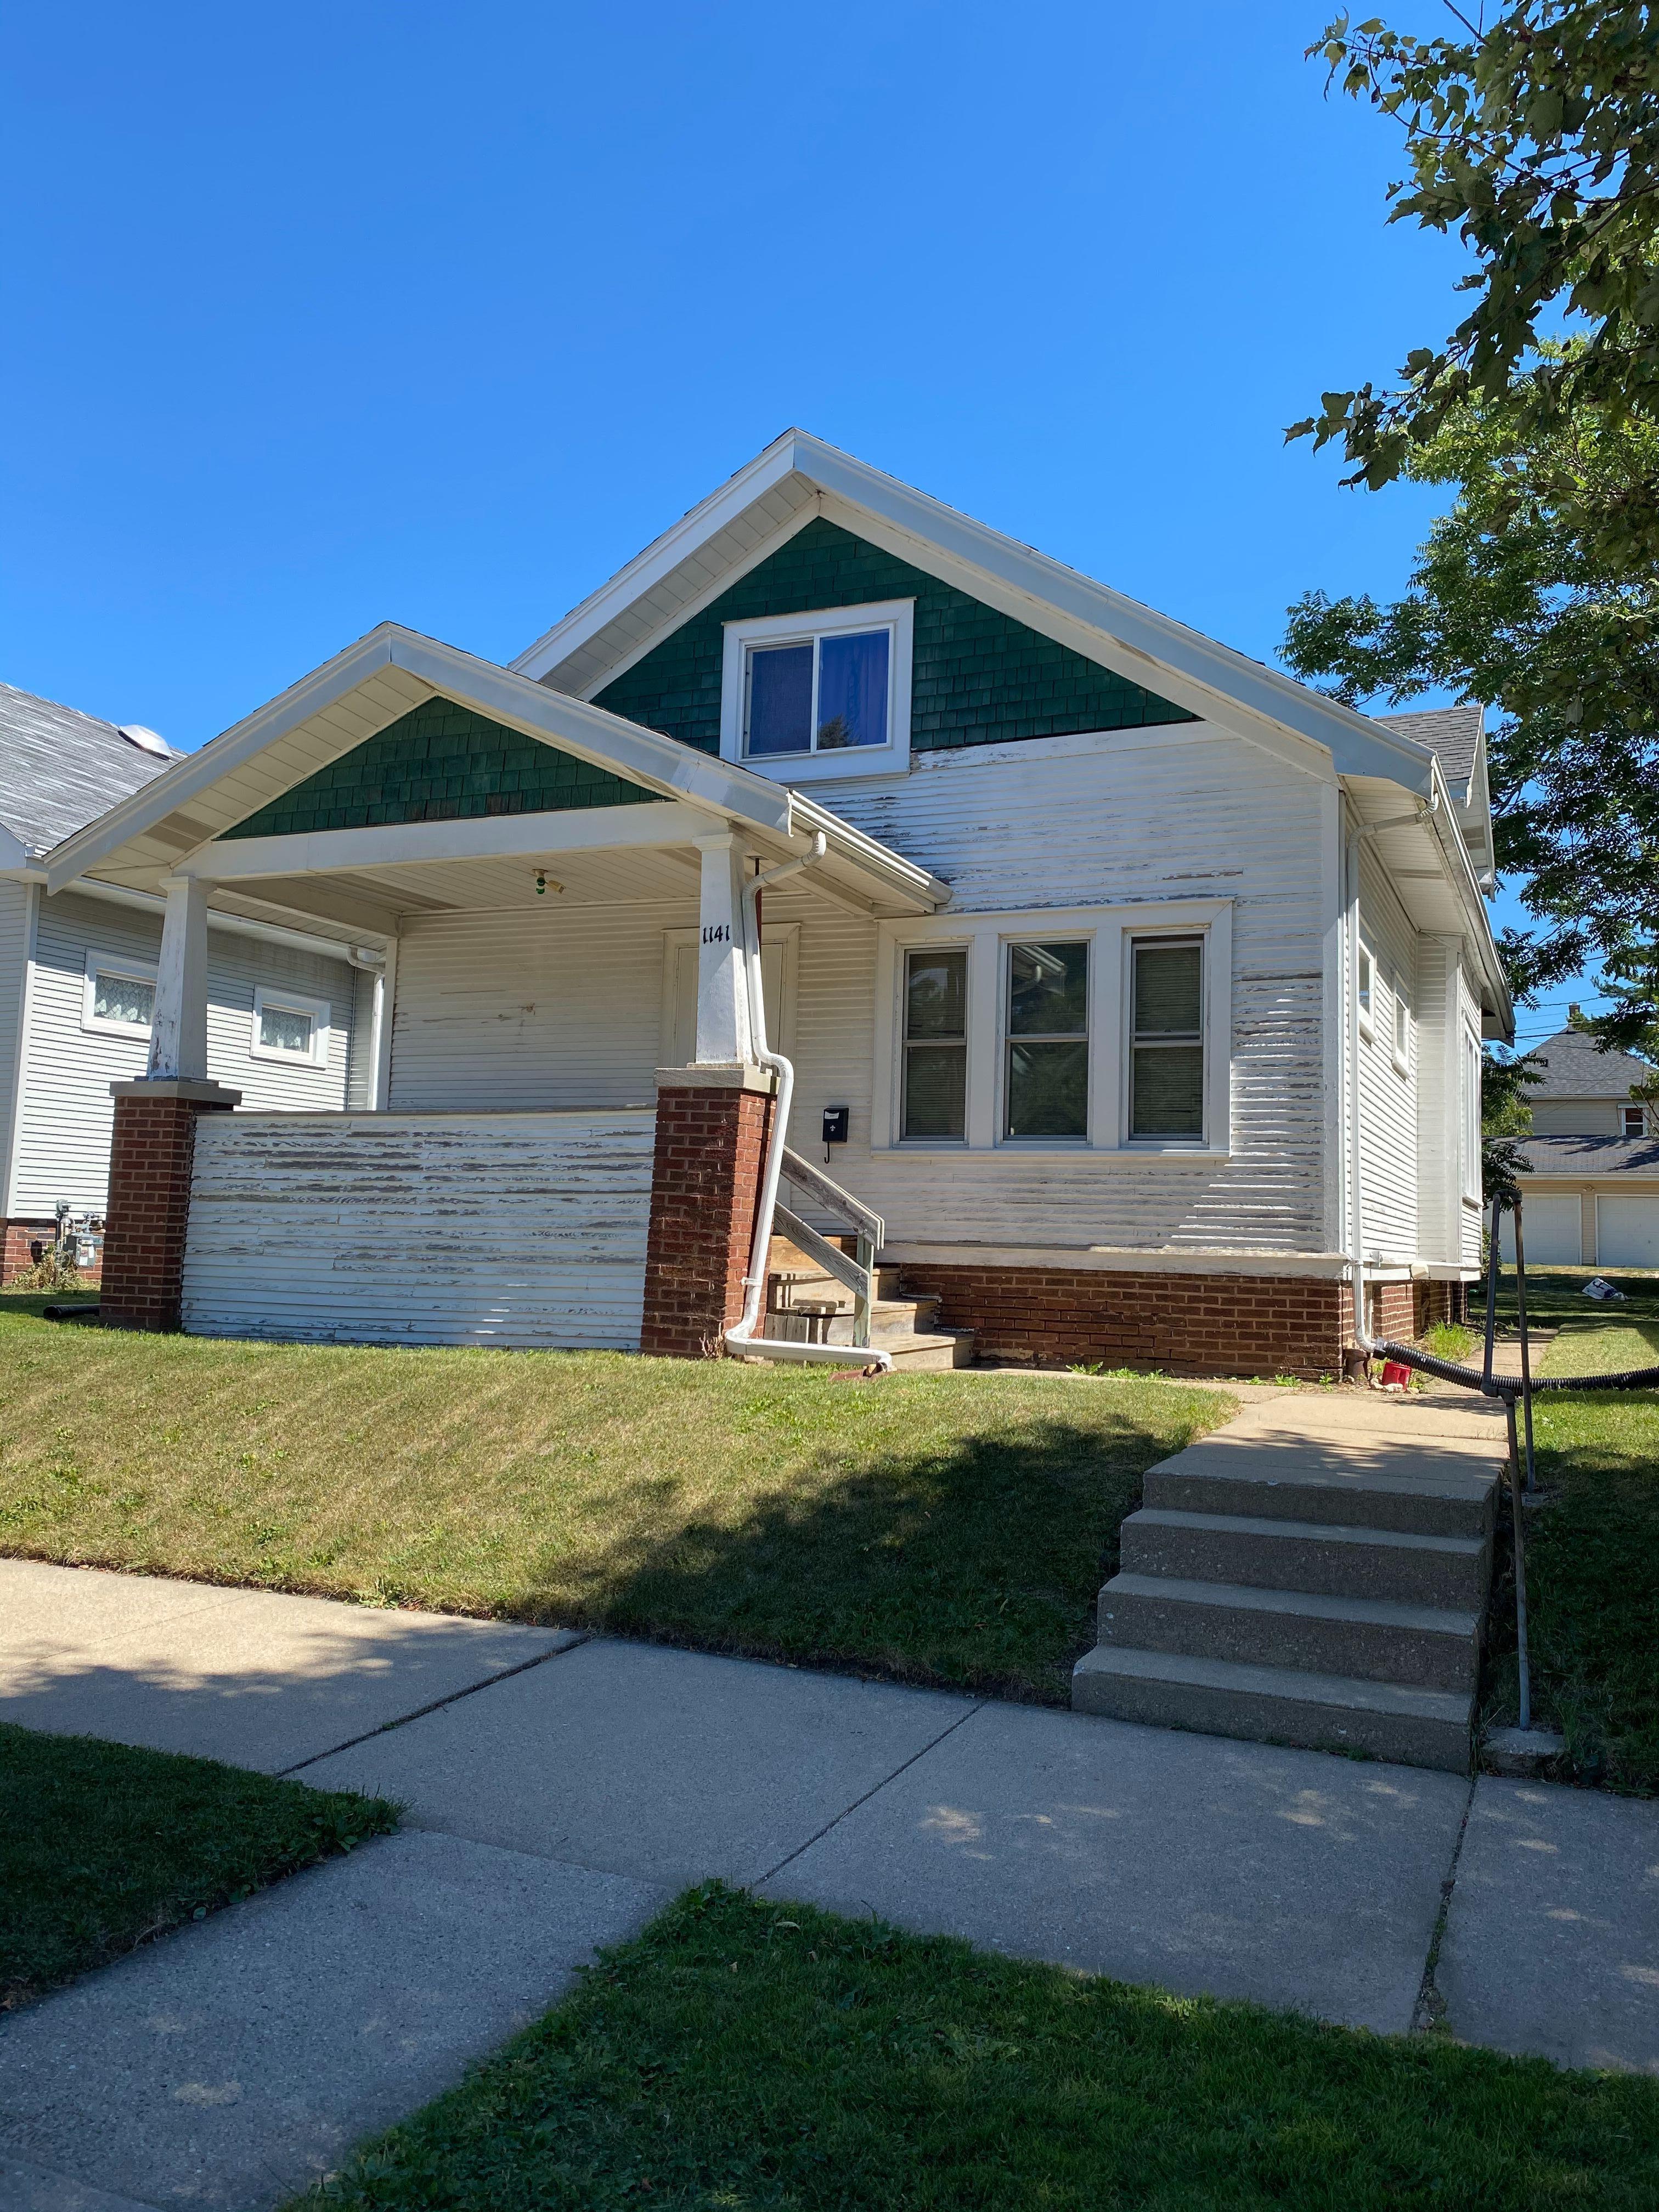 1141 Howard St, Racine, WI